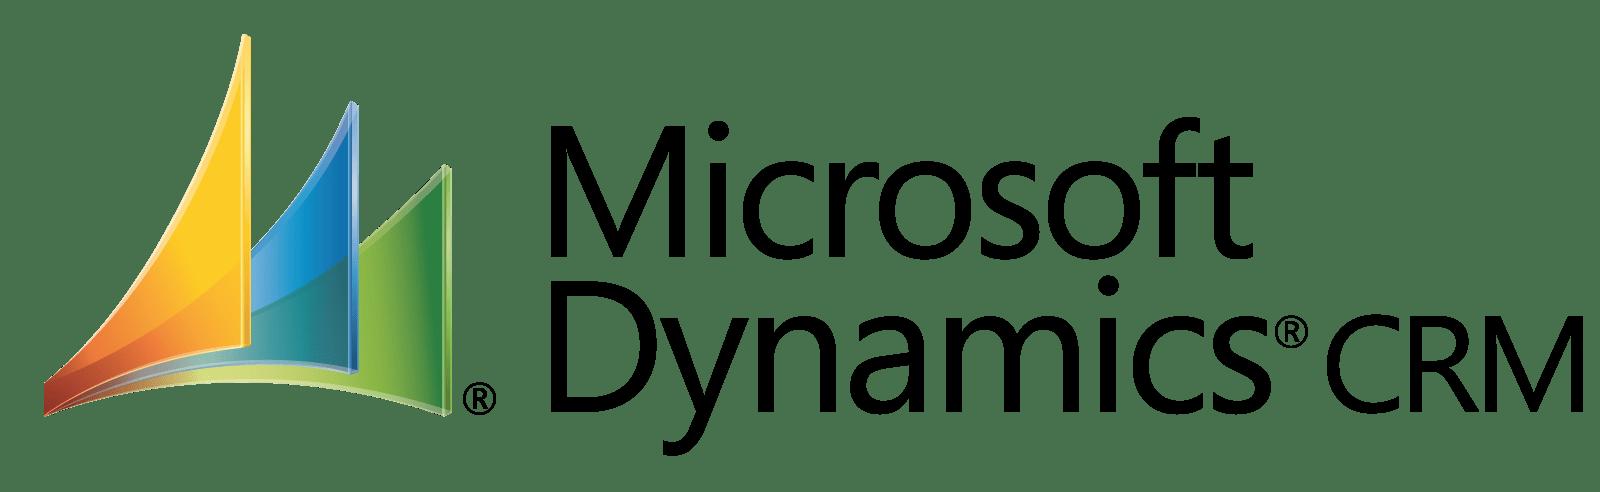 Partner - Microsoft Dynamics CRM